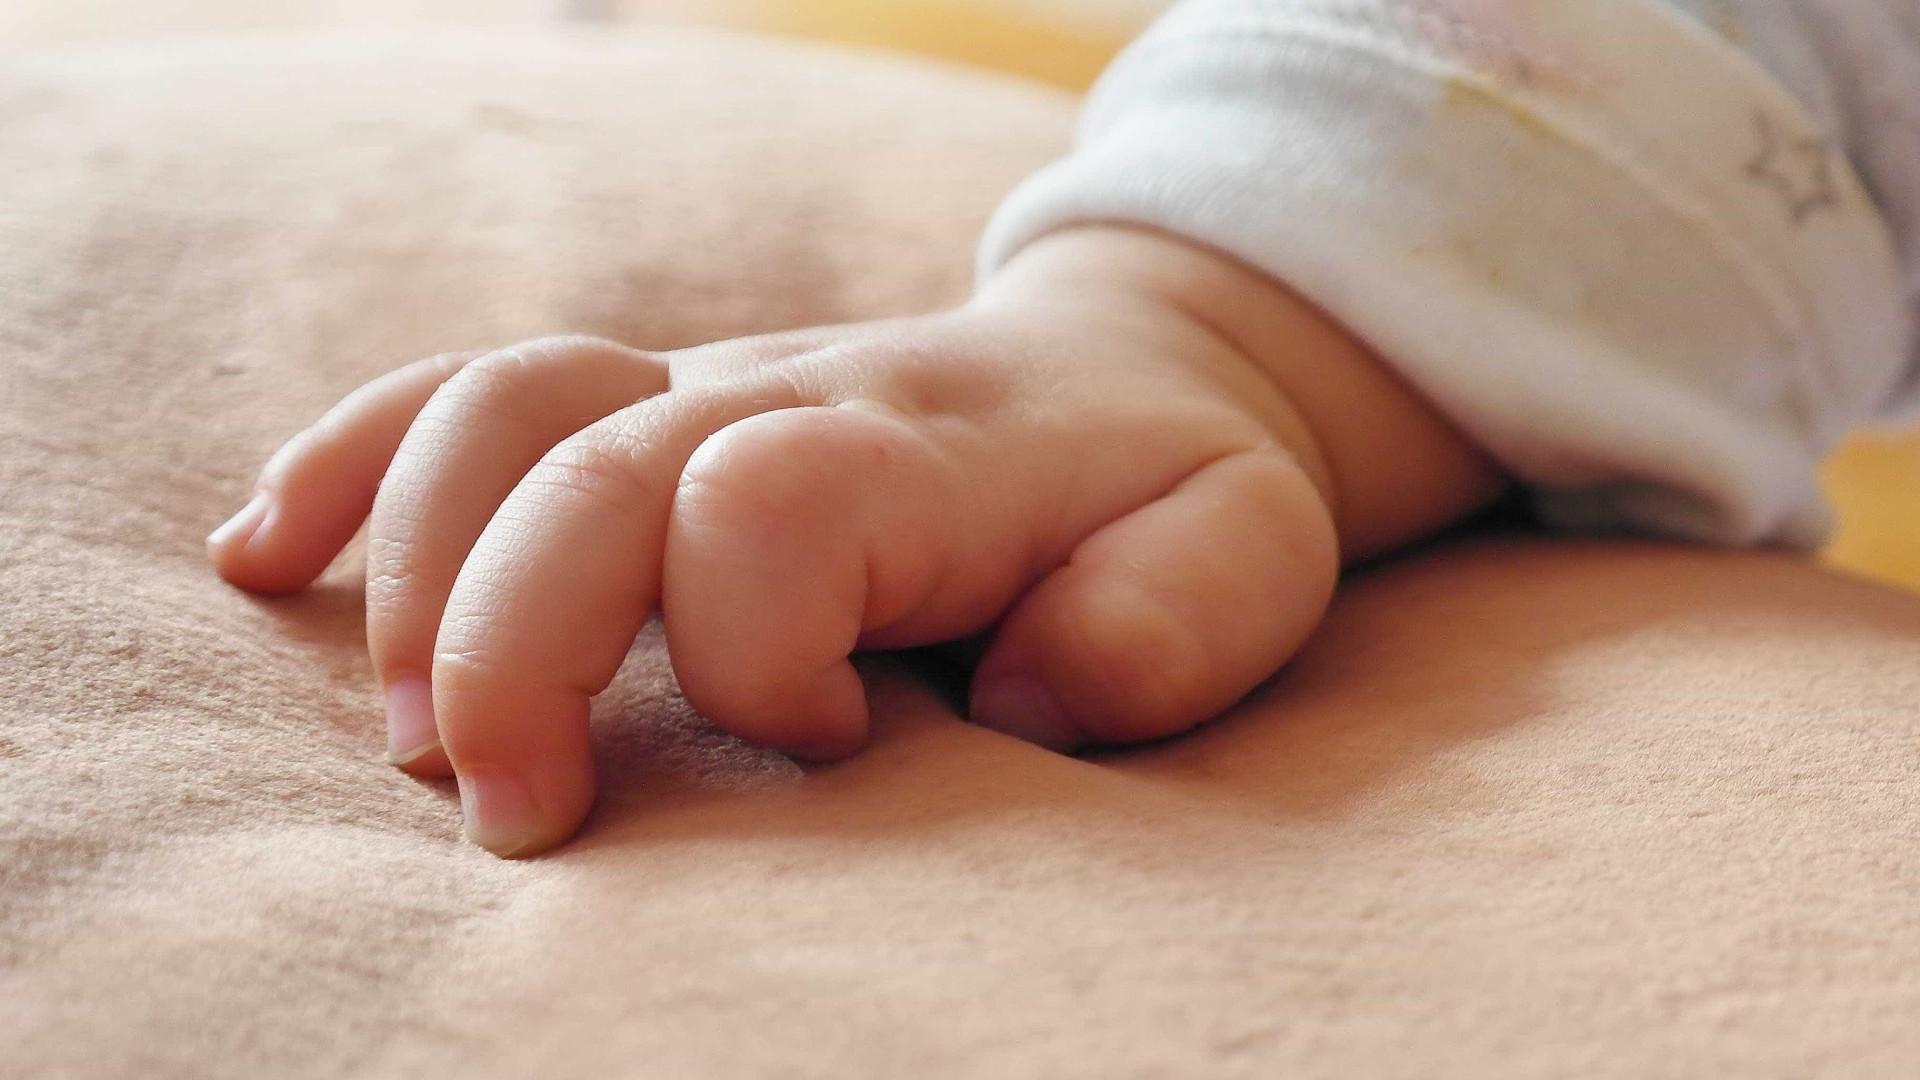 Mãe se arrepende de vender bebê por R$ 1,9 mil; pastor está envolvido